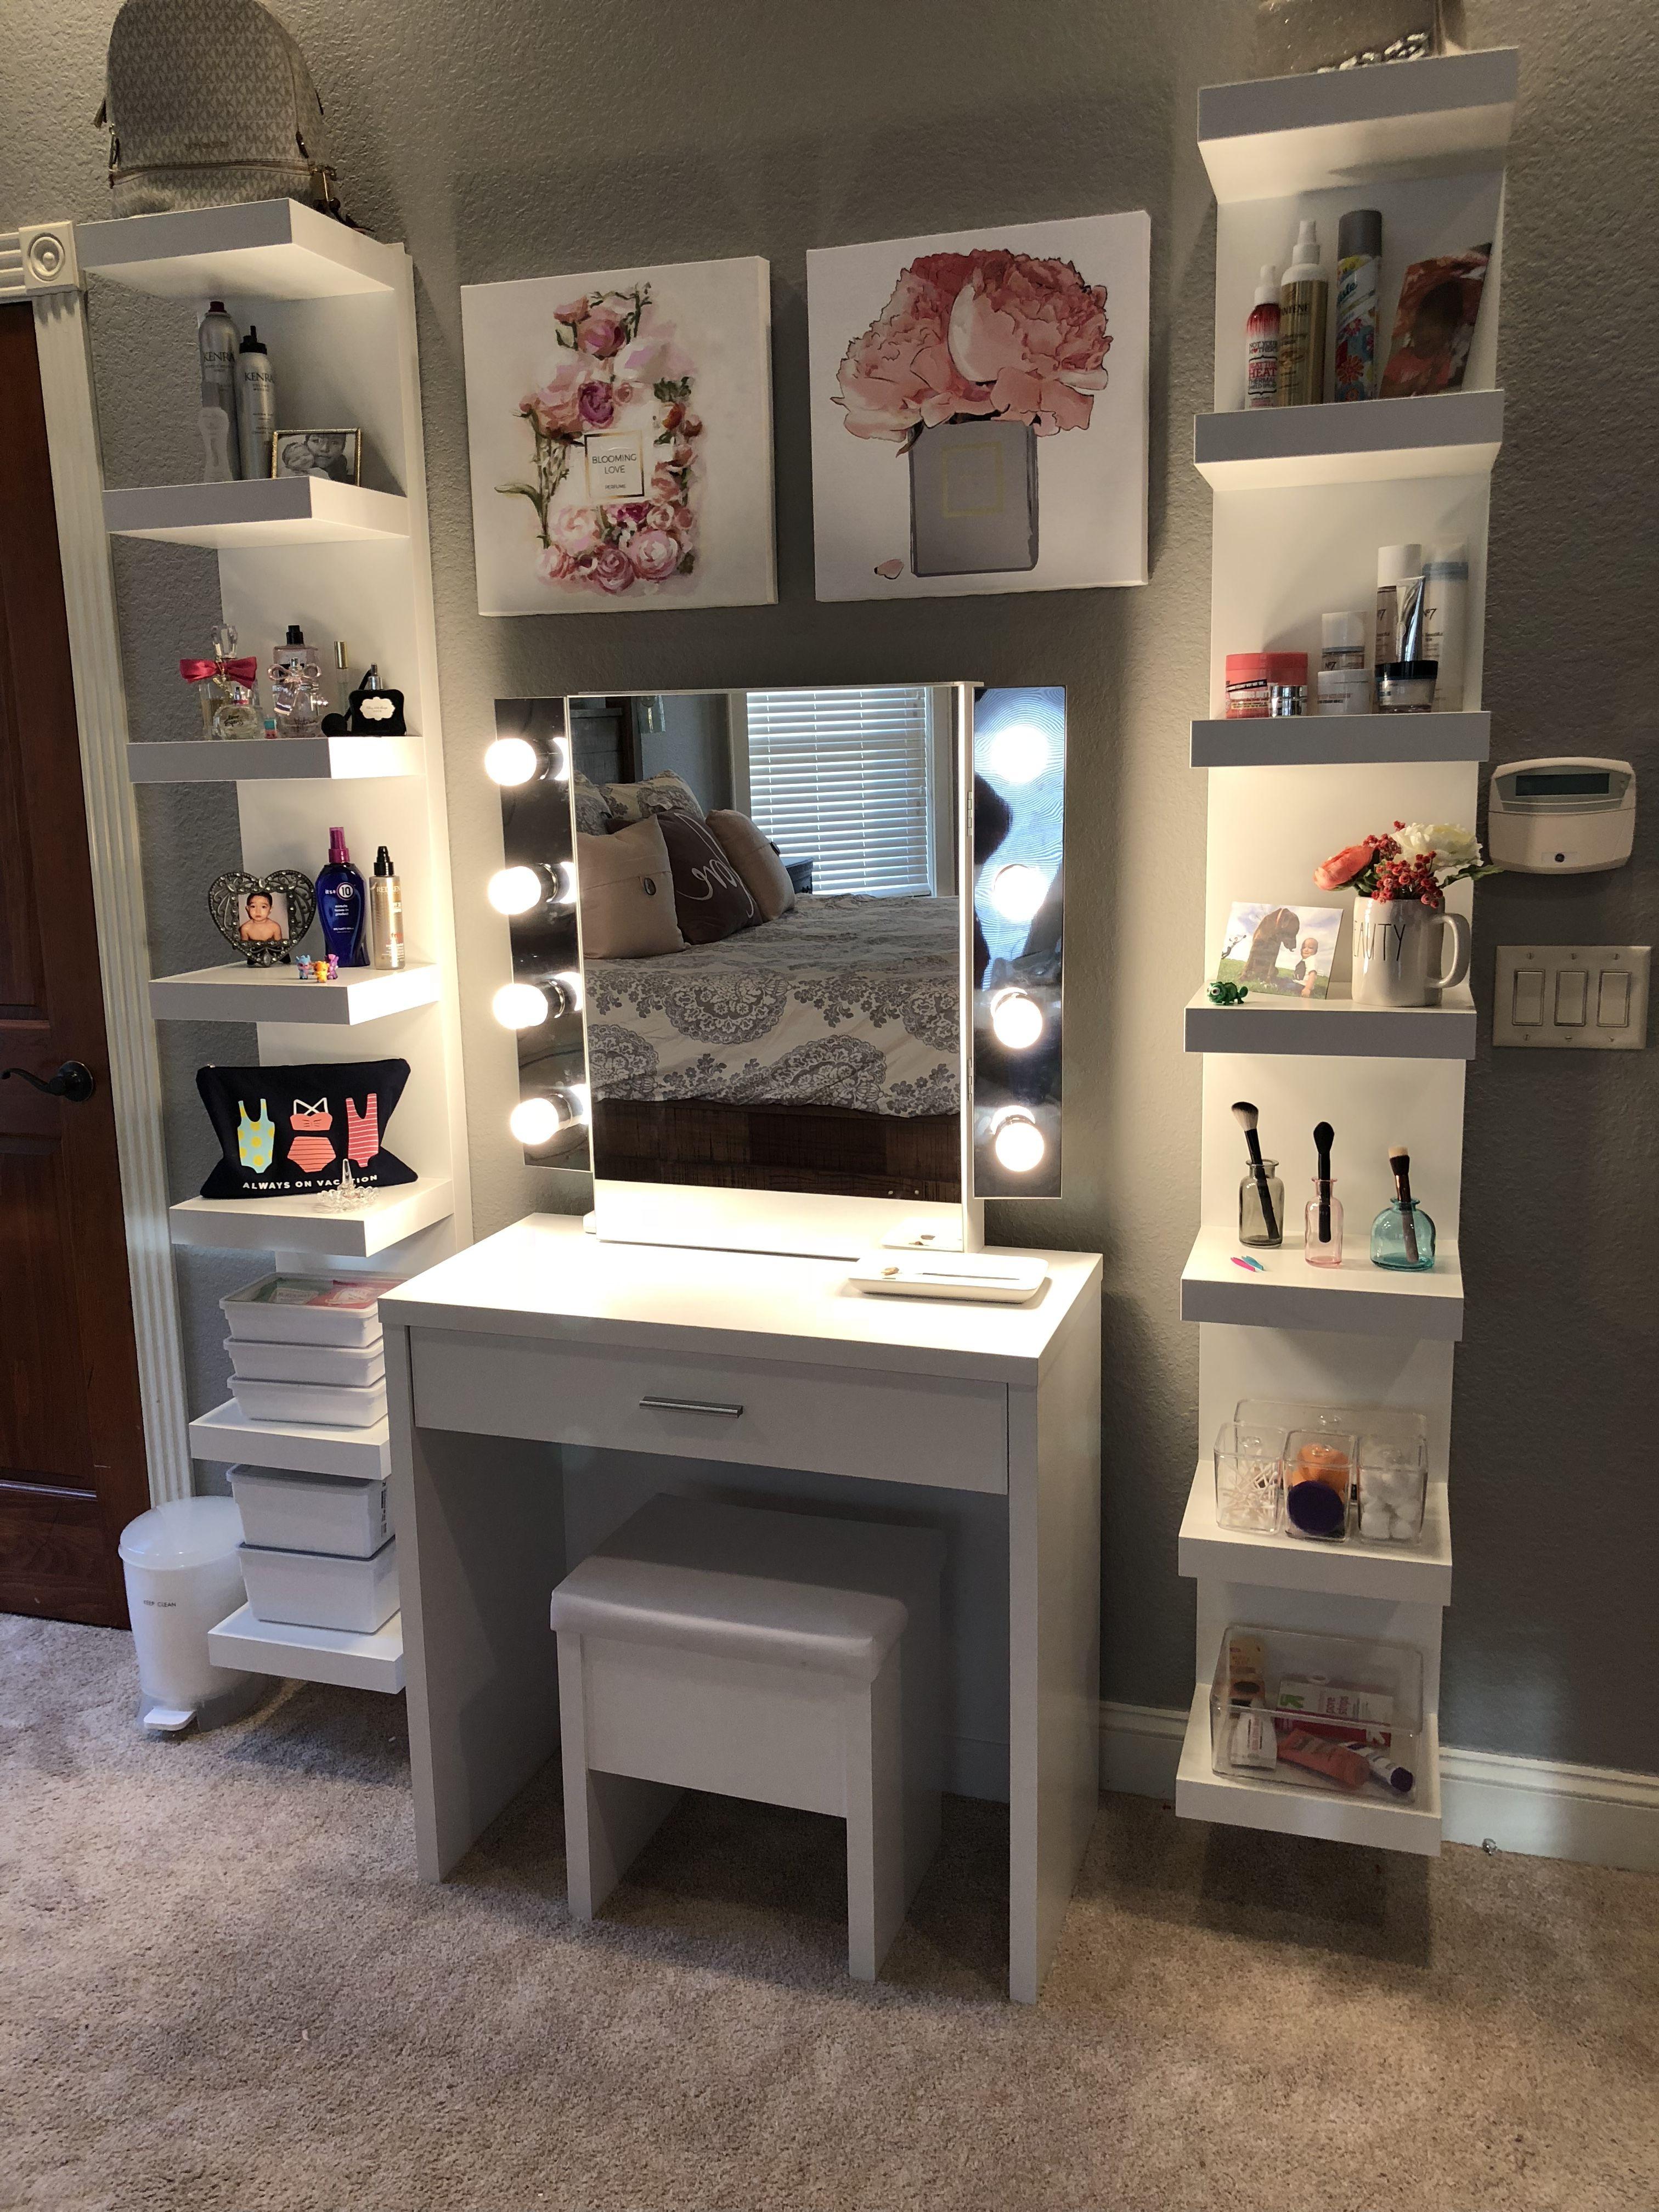 Makeup vanity  Chambre deco ado, Déco chambre ikea, Decor chambre